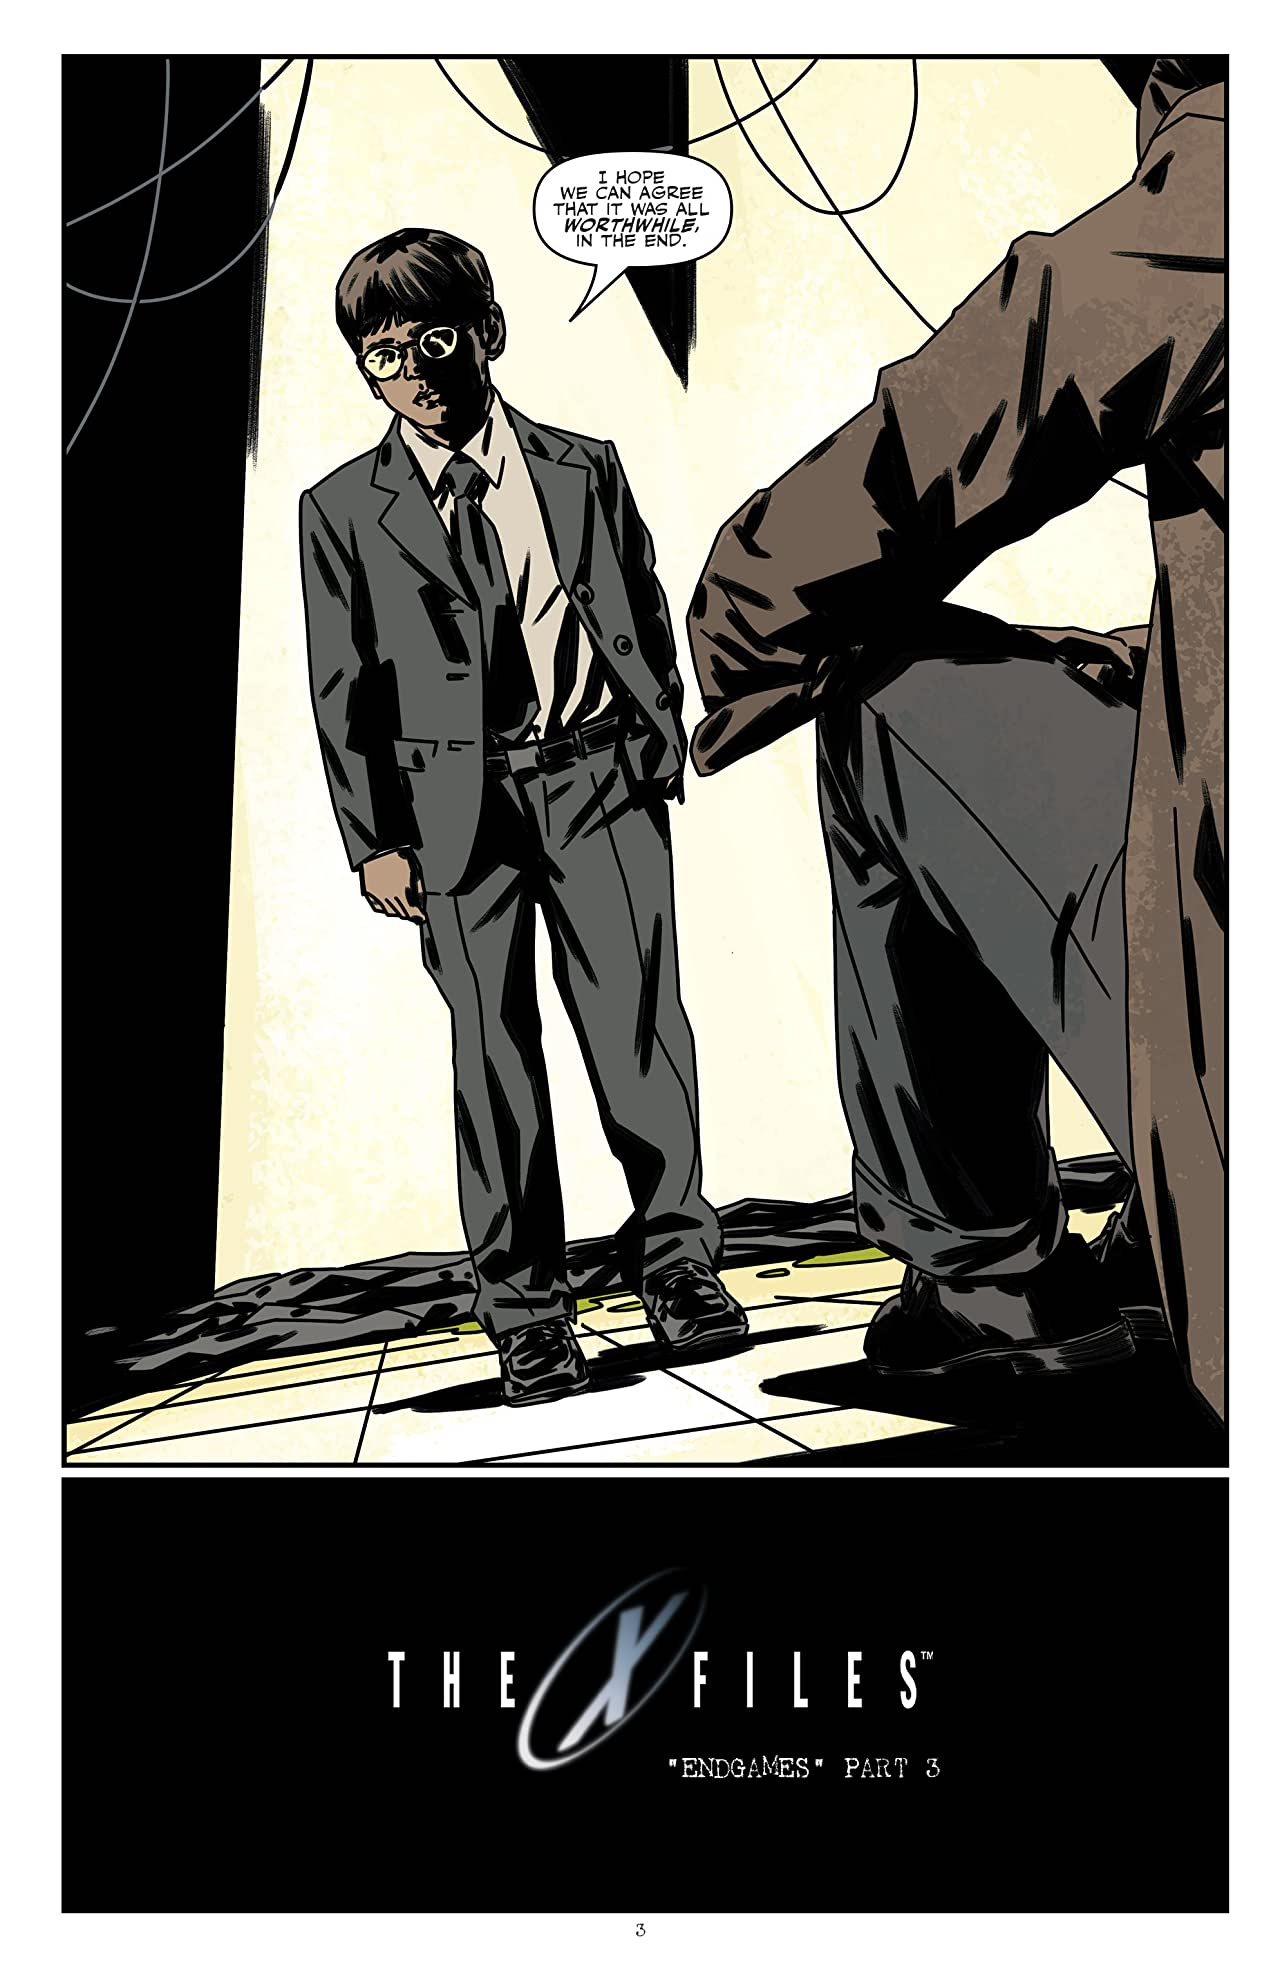 The X-Files: Season 11 #8